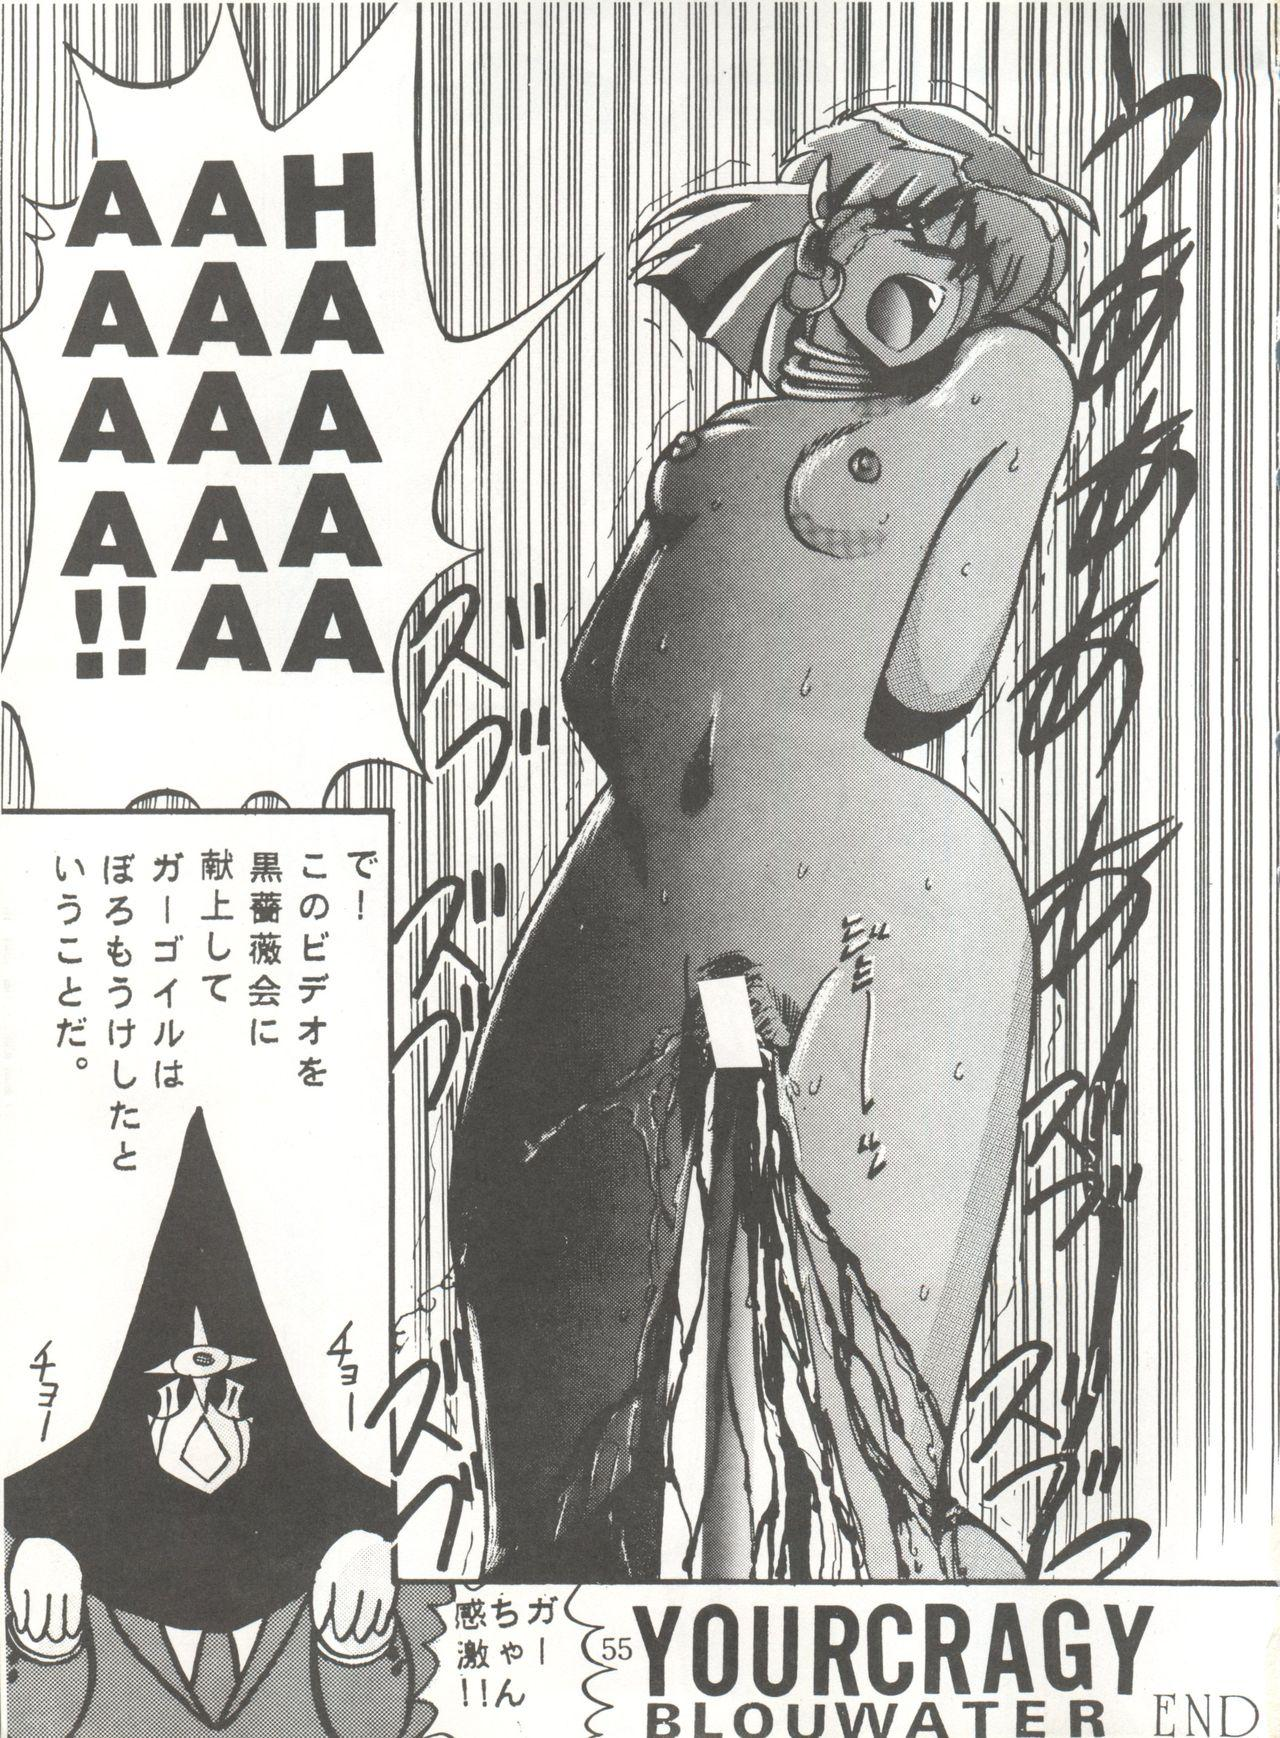 [Global One (MARO)] Sadistic 5 (Cutey Honey, Devilman, Sailor Moon), [Global One (MARO)] Sadistic (Dirty Pair, Fushigi no Umi no Nadia, Sailor Moon), [Studio Ikkatsumajin] .ribbon (Hime-chan's Ribbon) 114